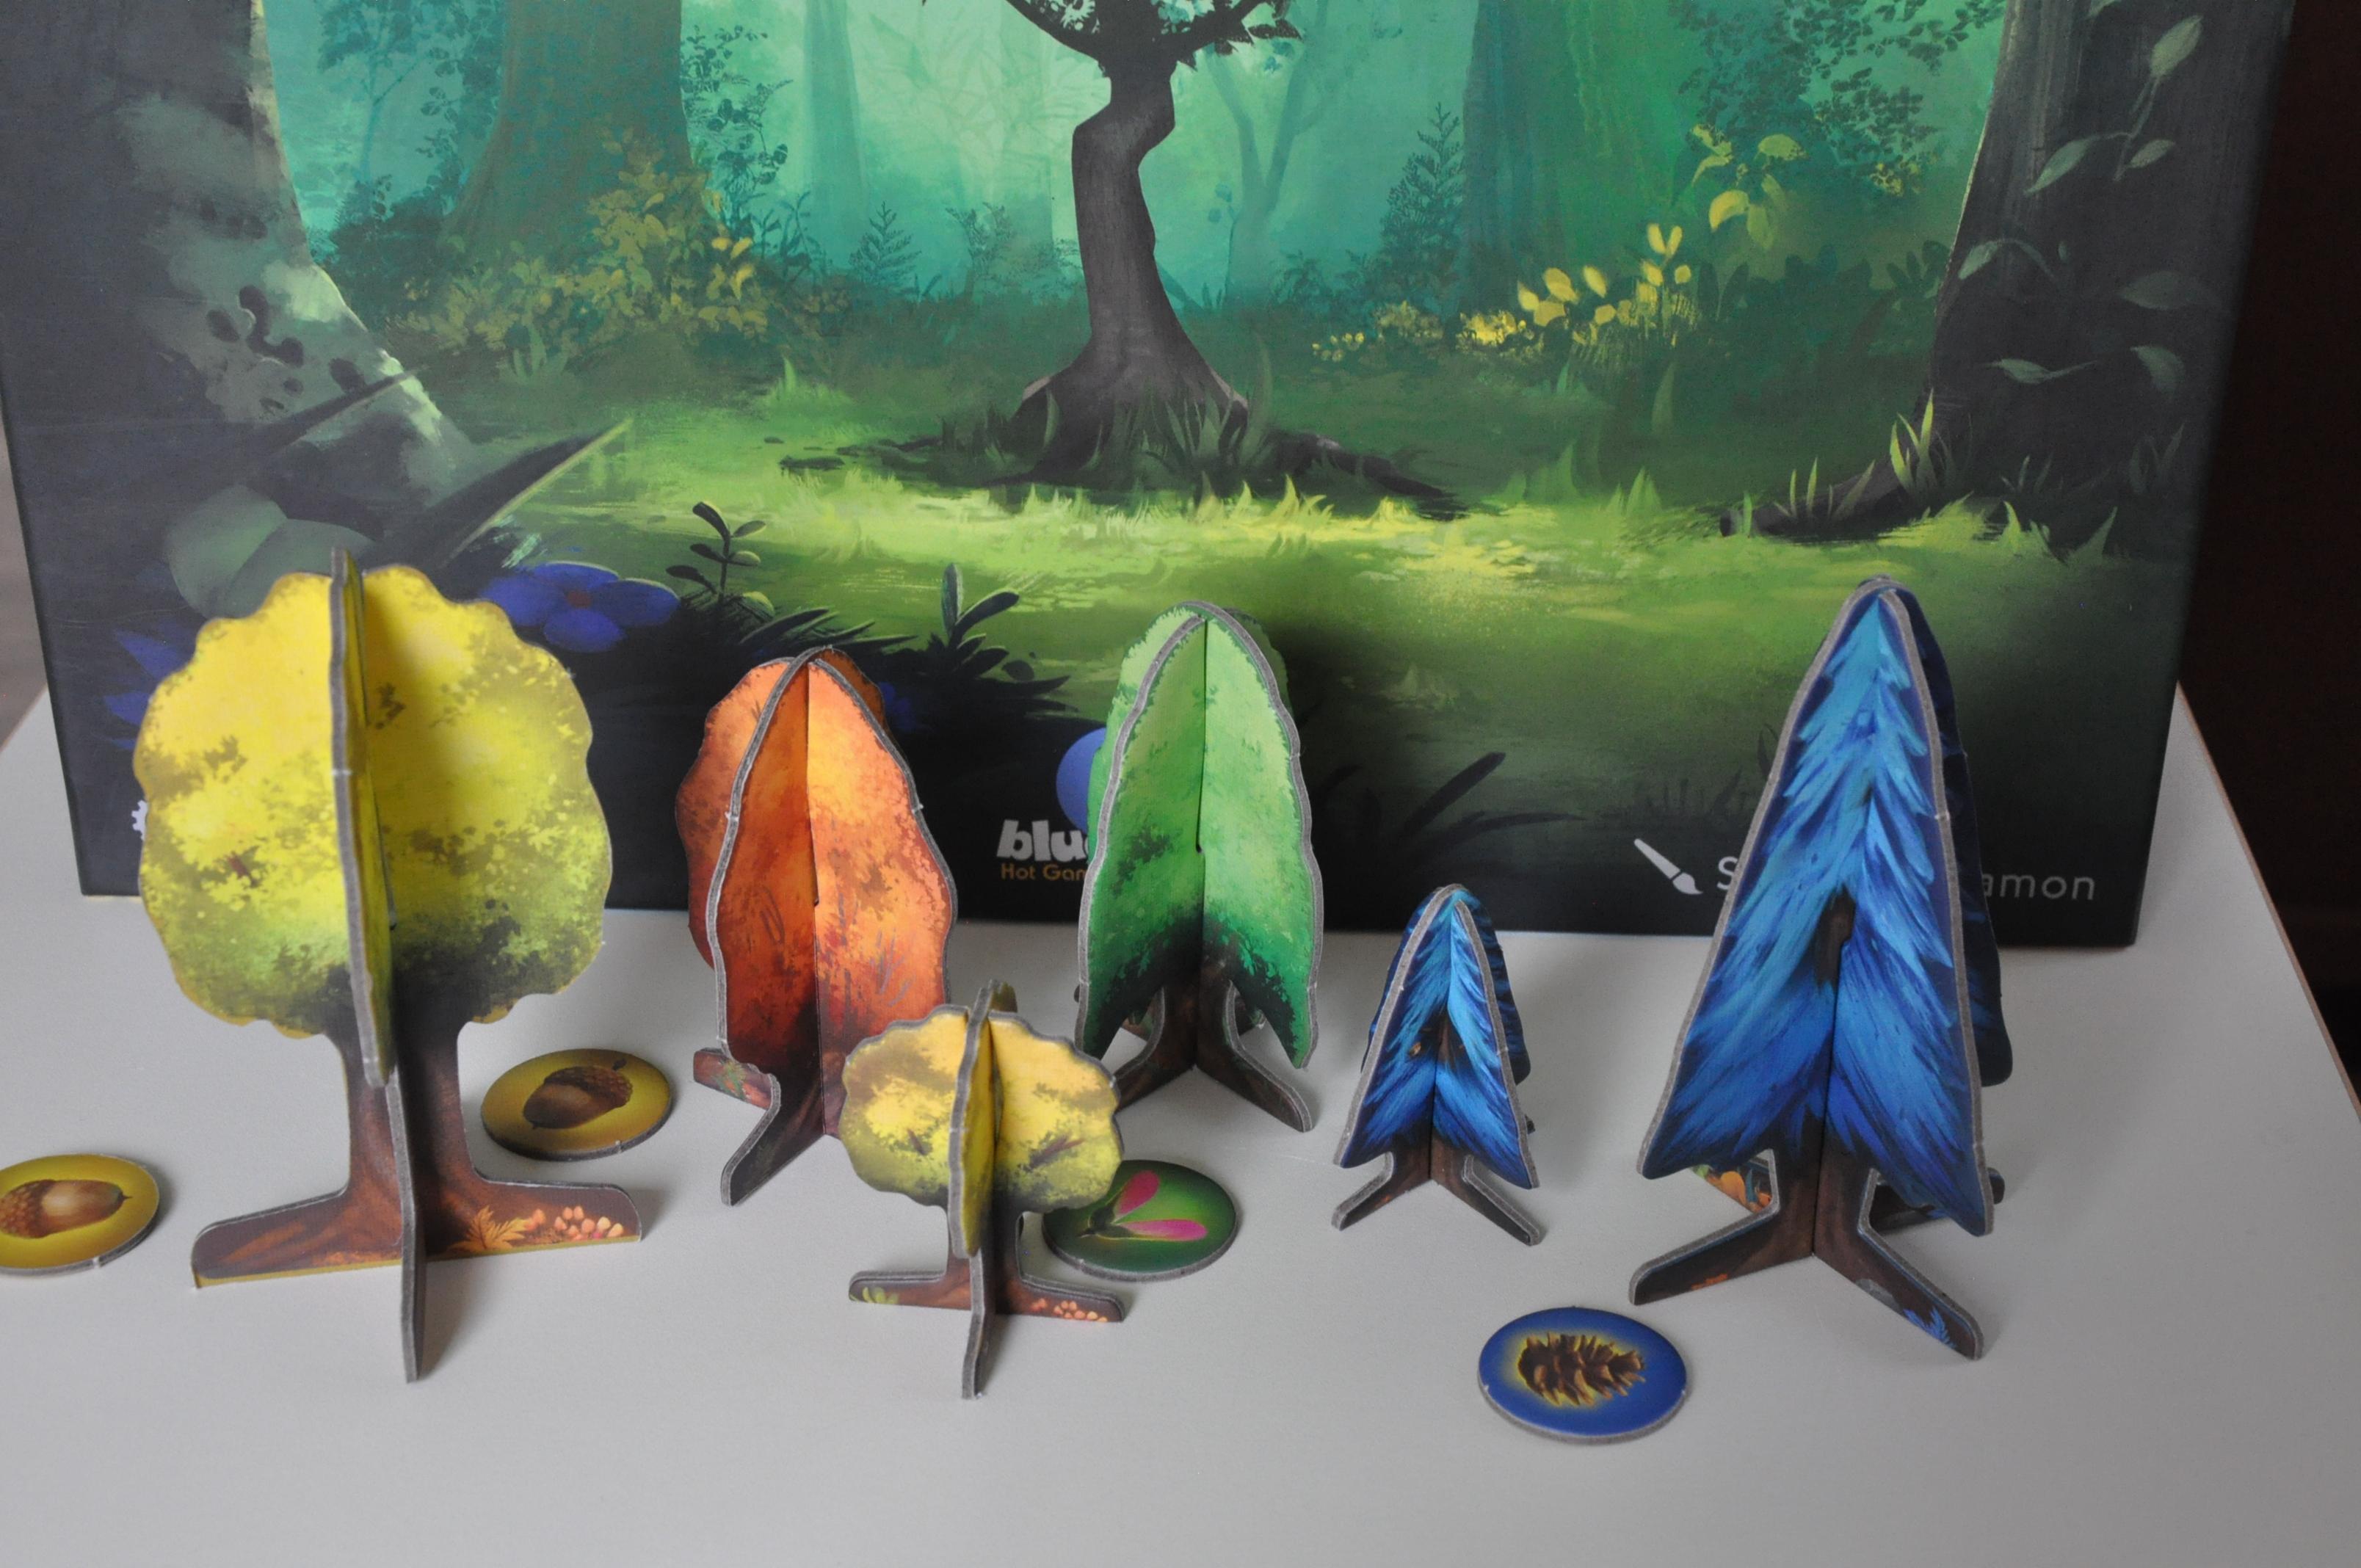 Kartonowe modele drzew inasiona